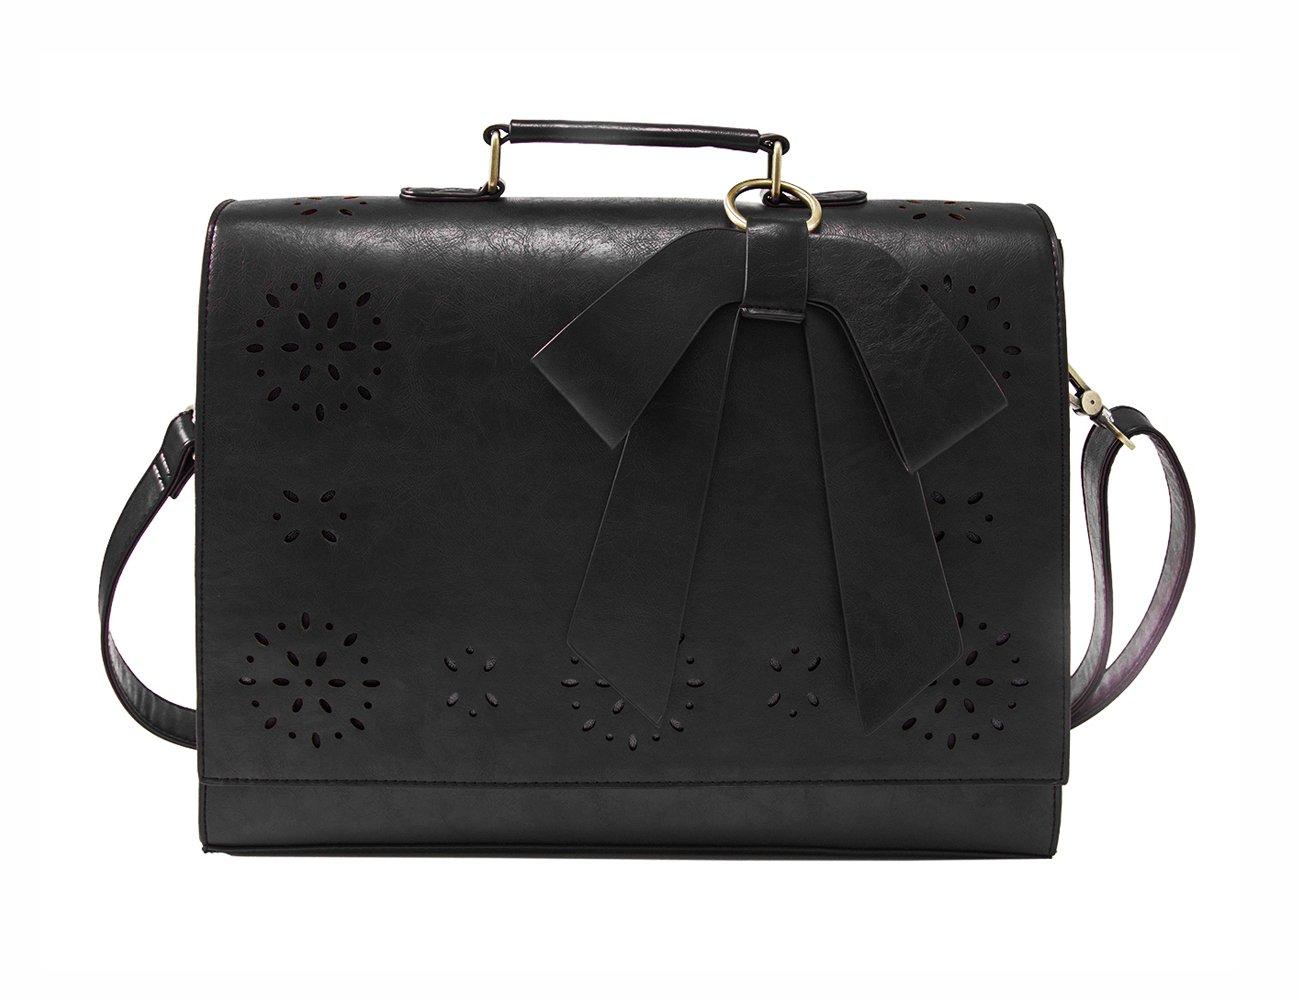 ECOSUSI Ladies PU Leather Laptop Bag Briefcase Crossbody Messenger Bags Satchel Purse Fit 14'' Laptop, Black